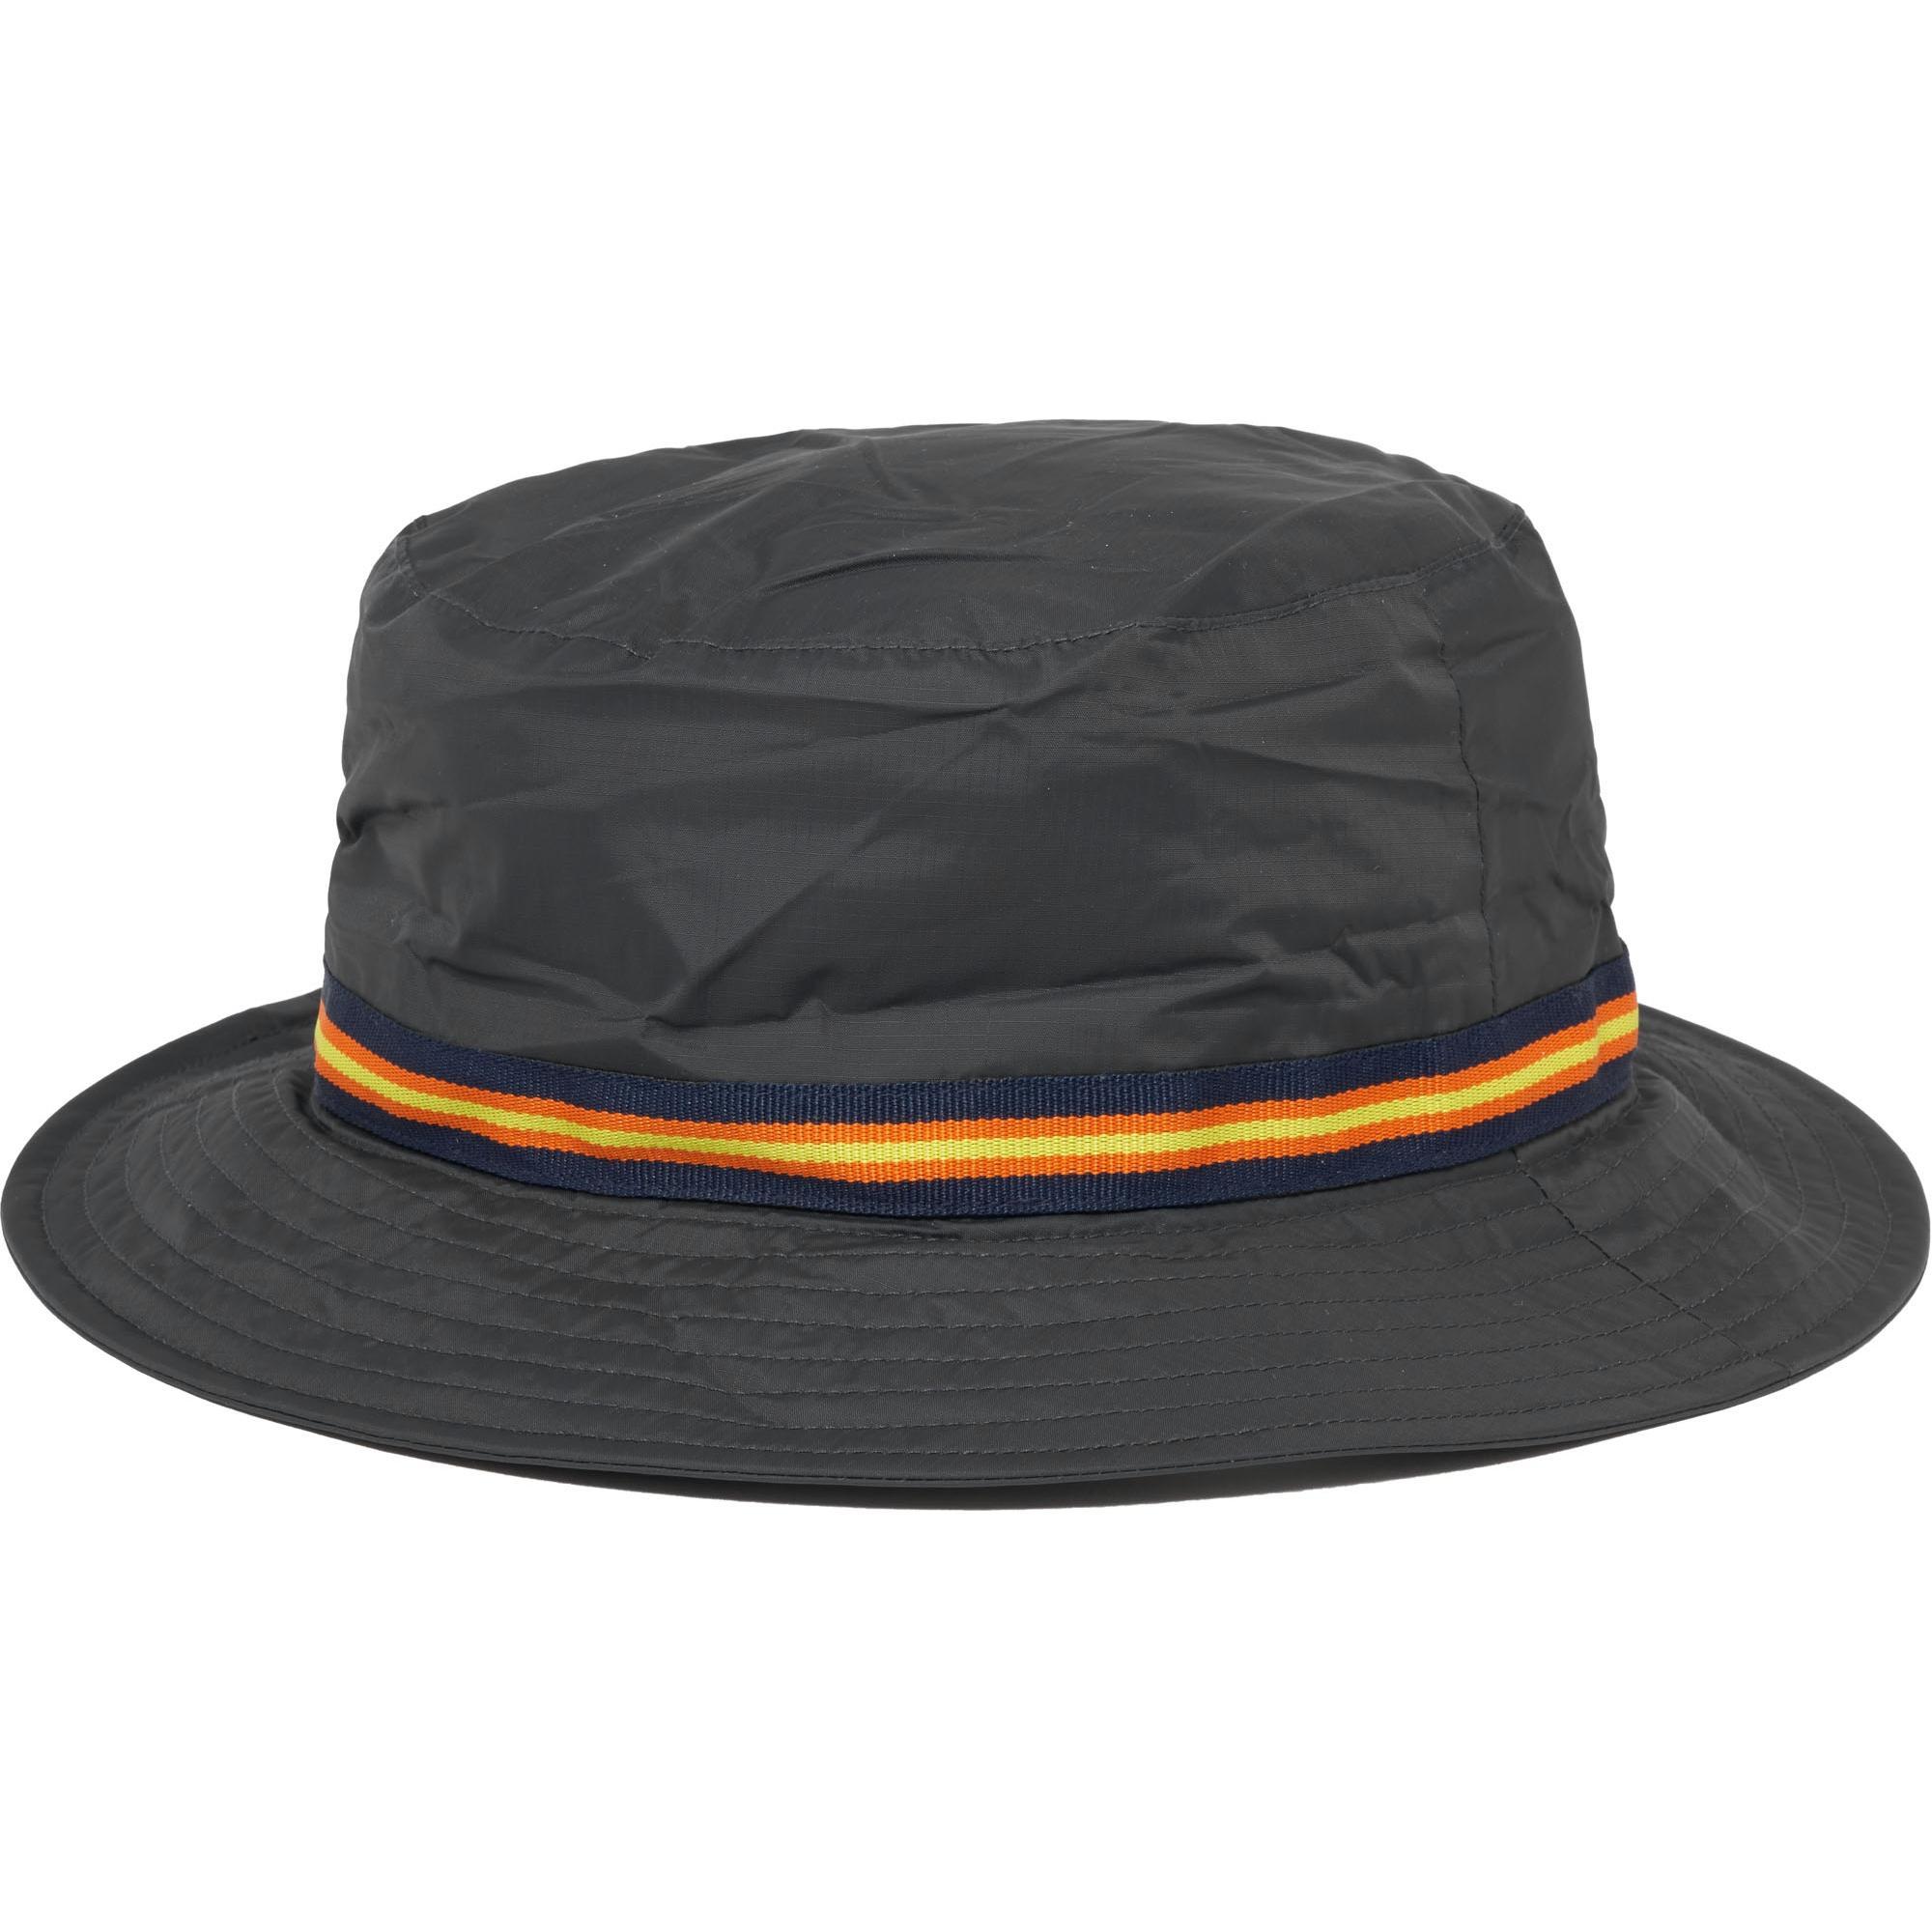 04879a92 K-Way Black Le Vrai Pascal 3.0 Packable Bucket Hat in Black for Men ...